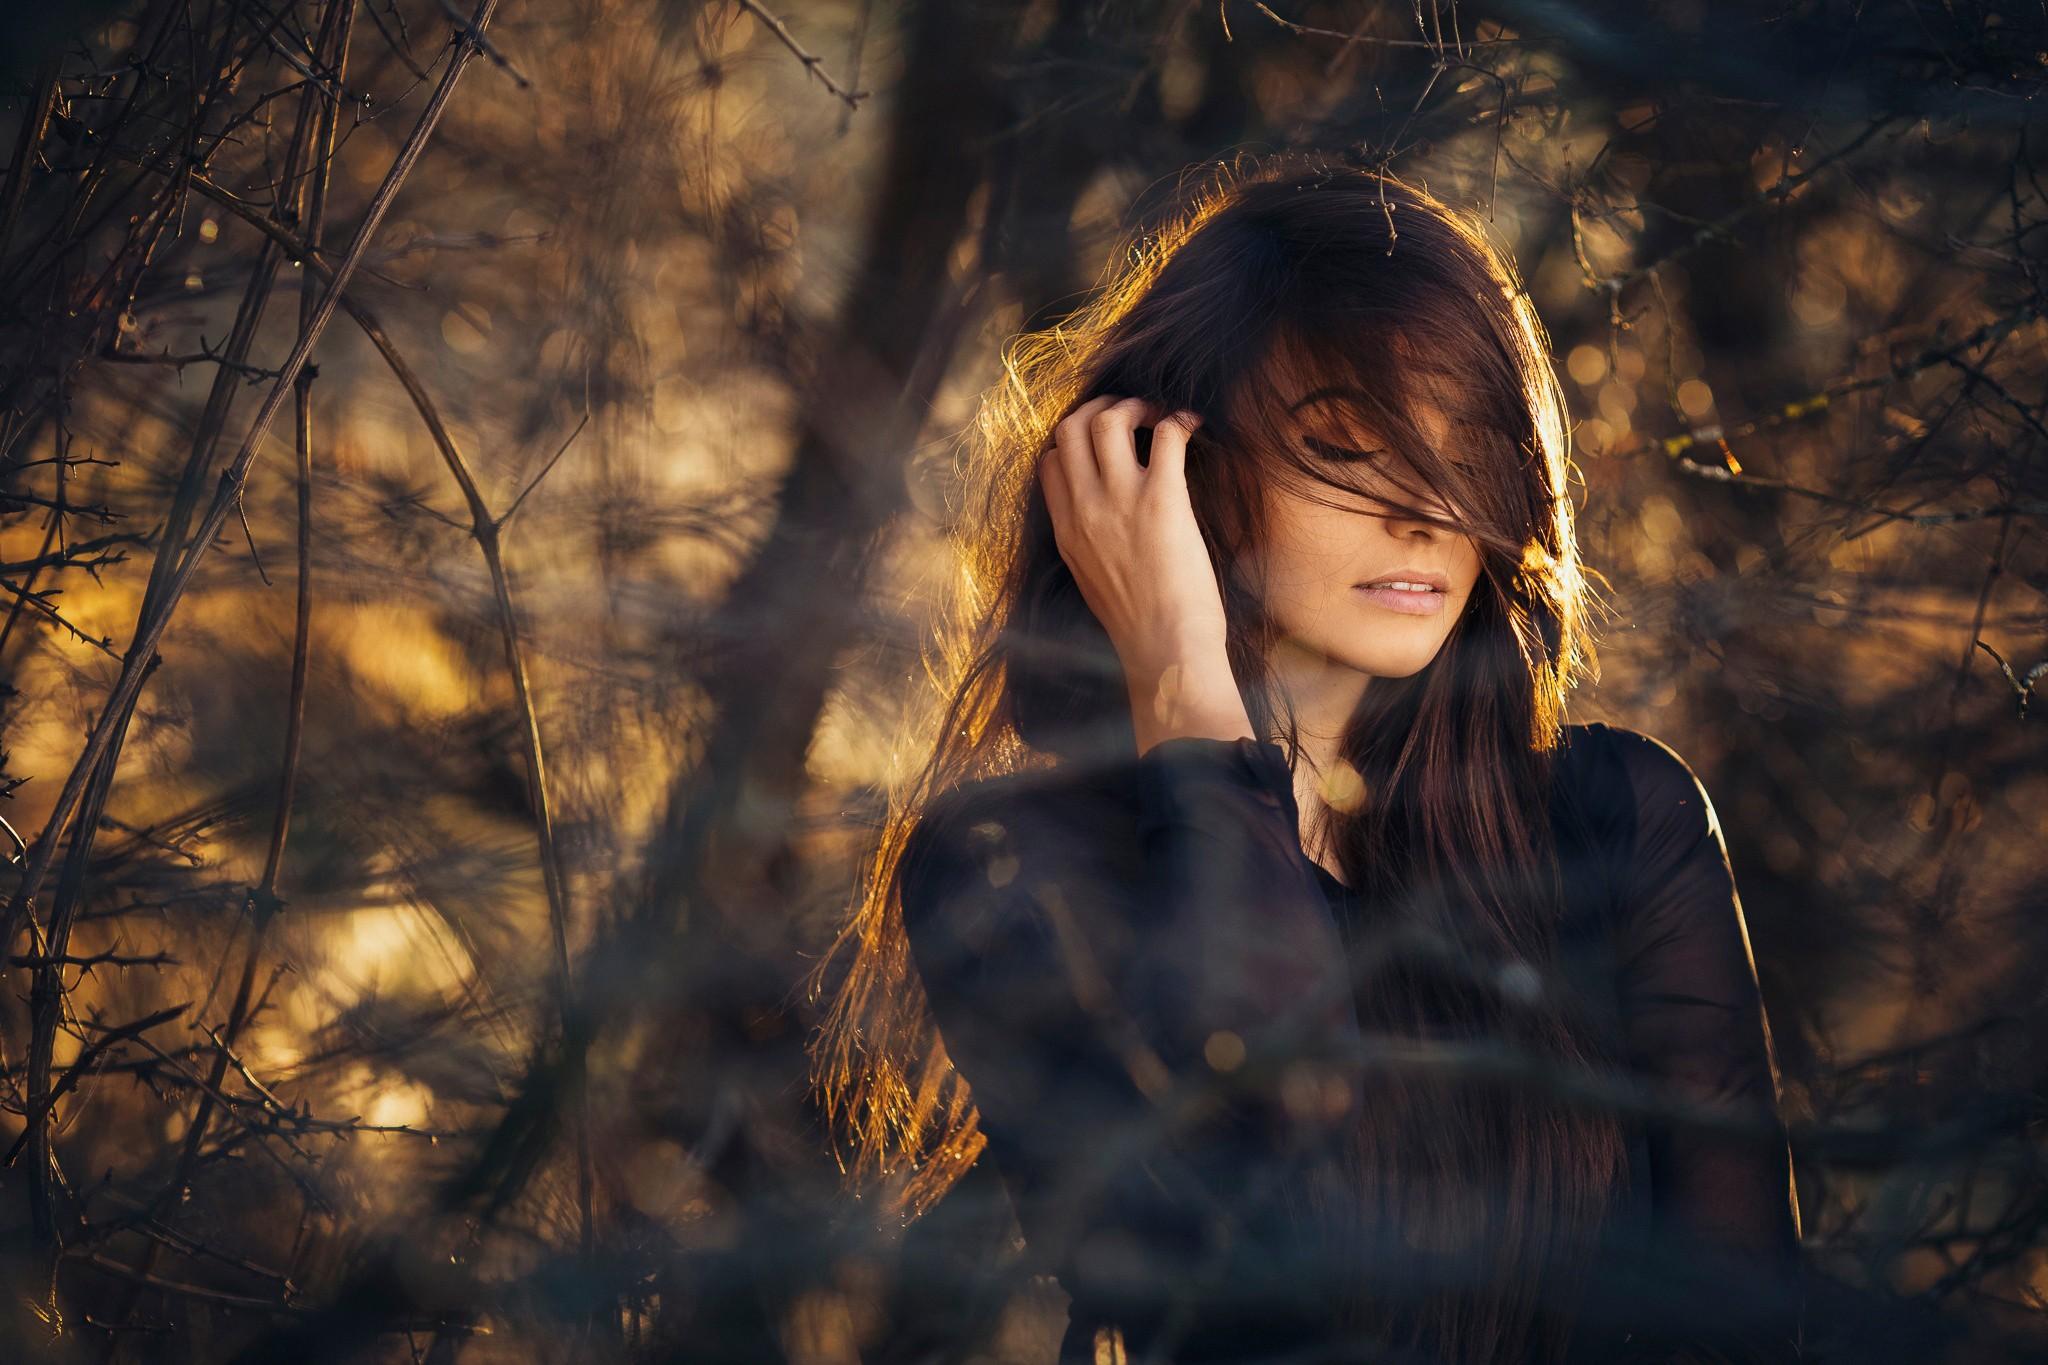 women, Brunette, Model, Long hair, Nature, Field, Women